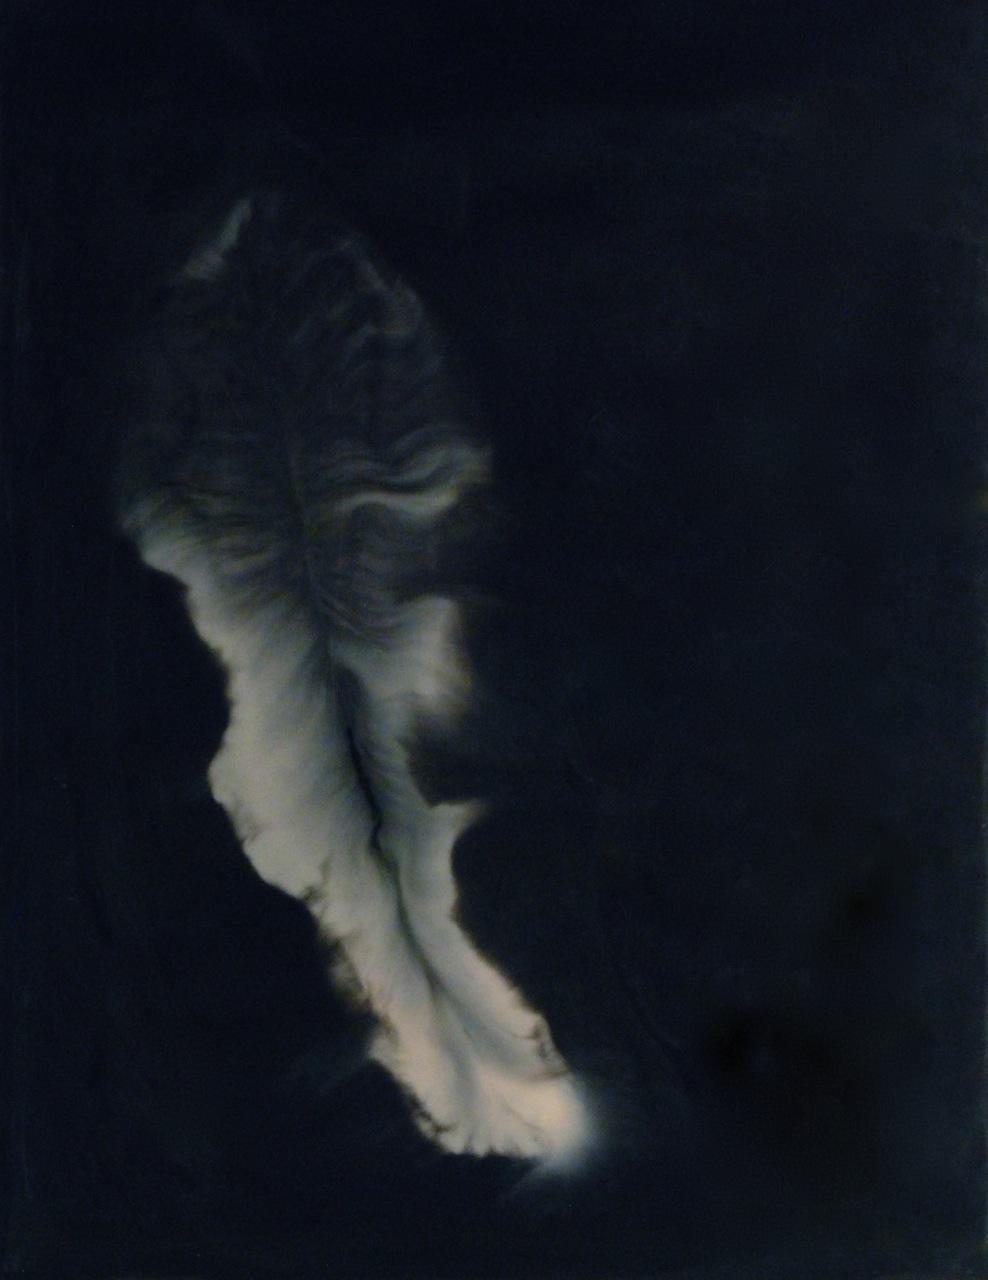 Peter Flaccus, Feather, 2009, encausto su tavola, cm 61x47